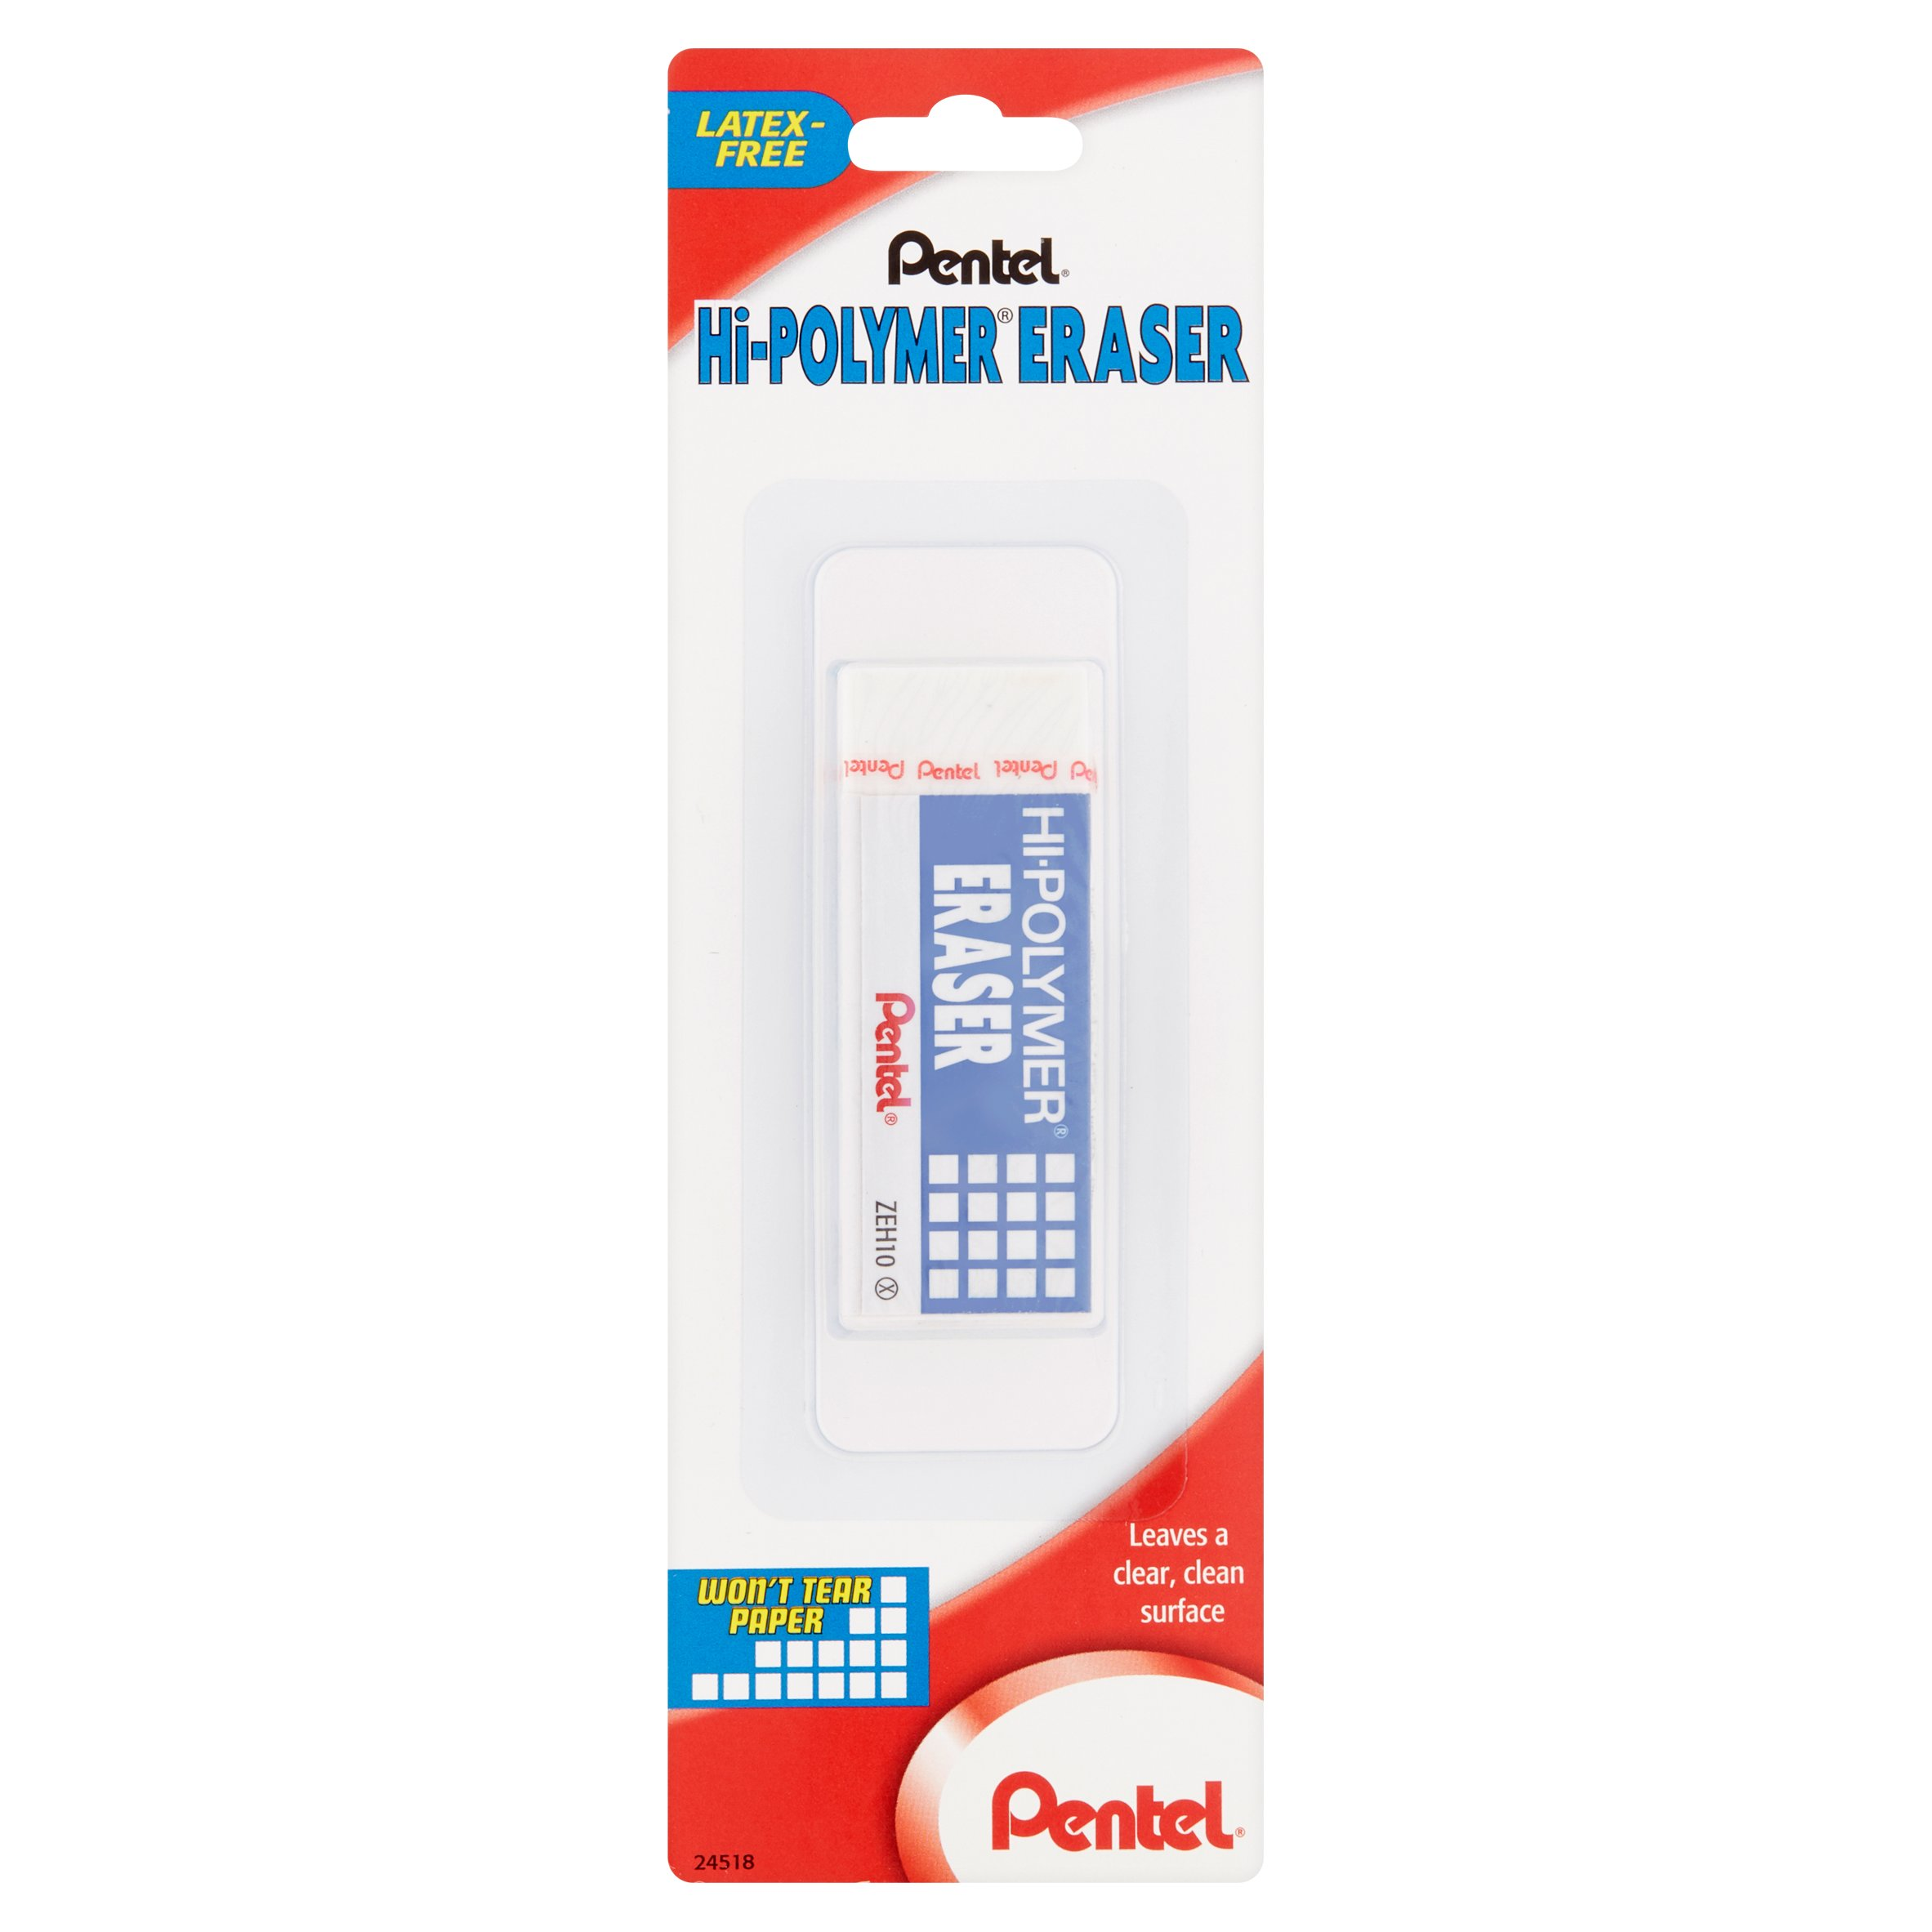 Pentel Hi-Polymer High Quality Plastic Eraser